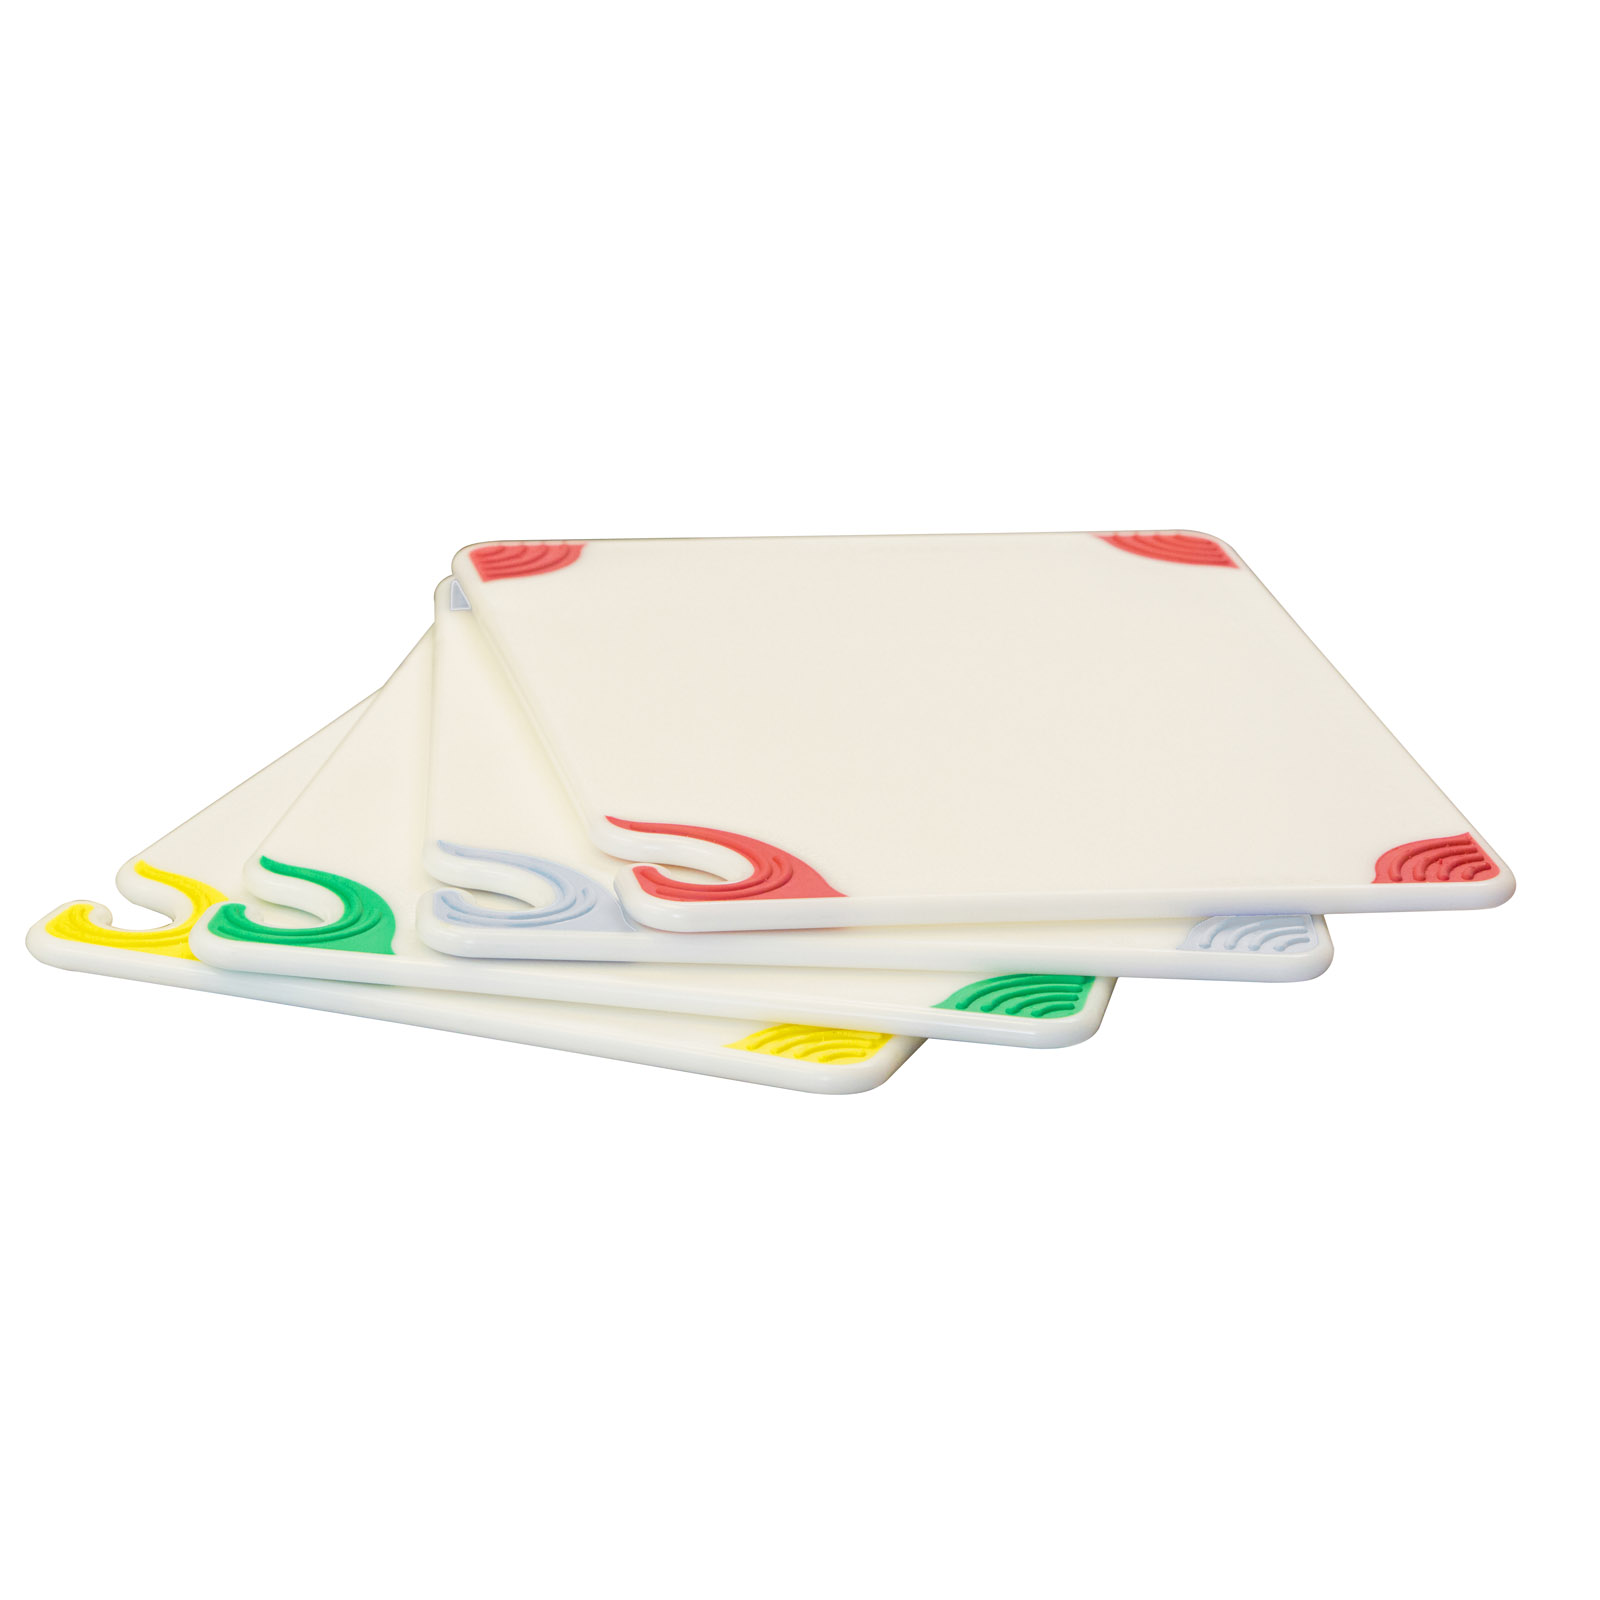 San Jamar CBGW152012QS cutting board, plastic